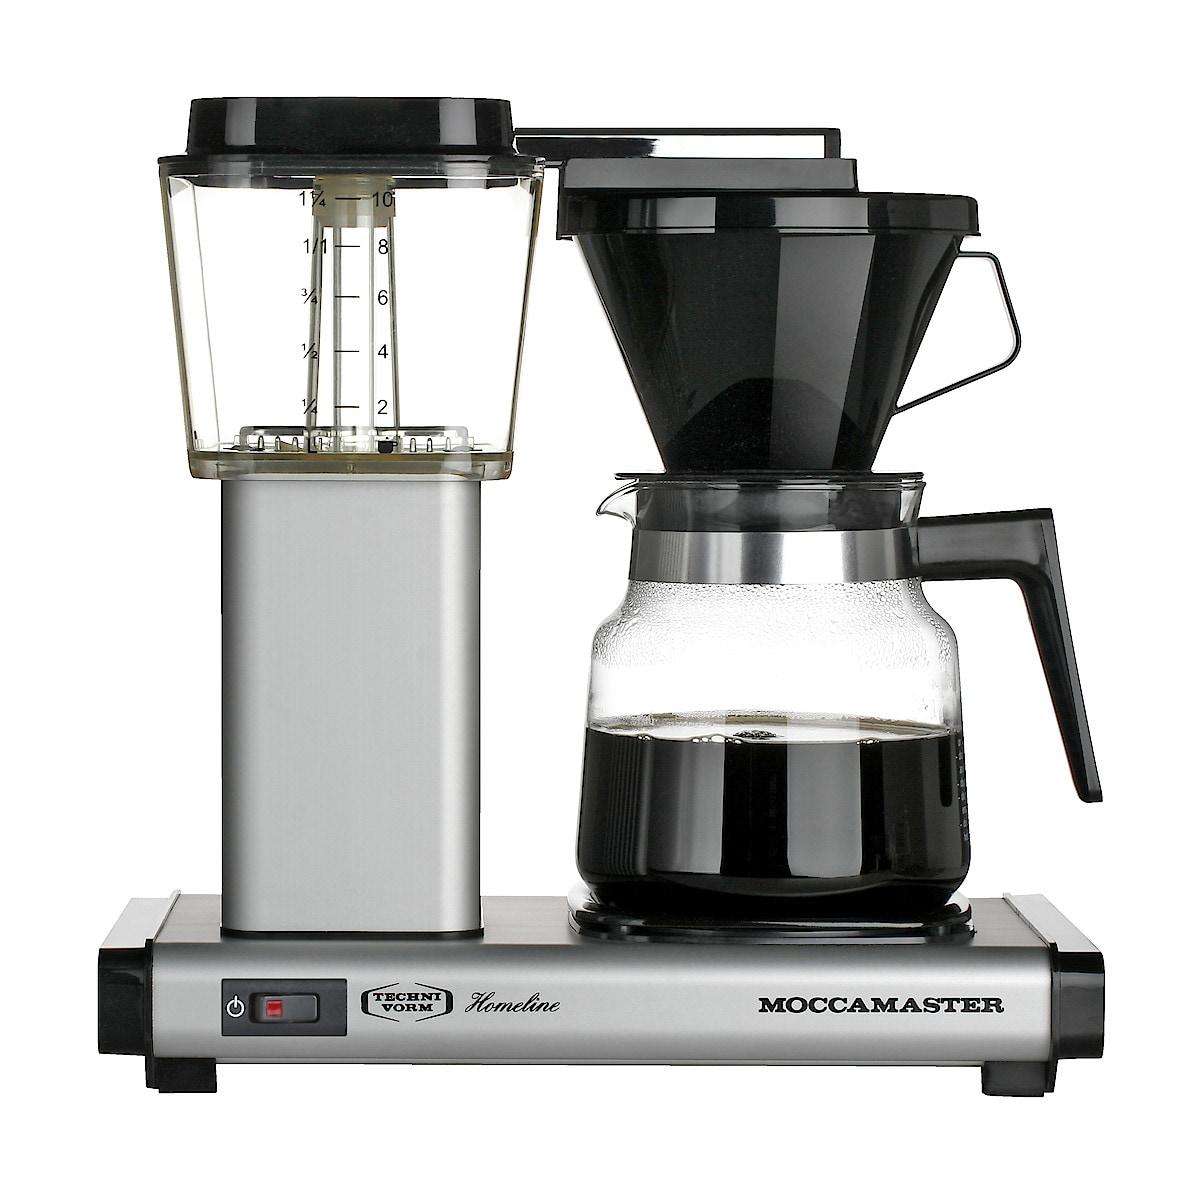 Moccamaster Basic H931 AO kaffebryggare